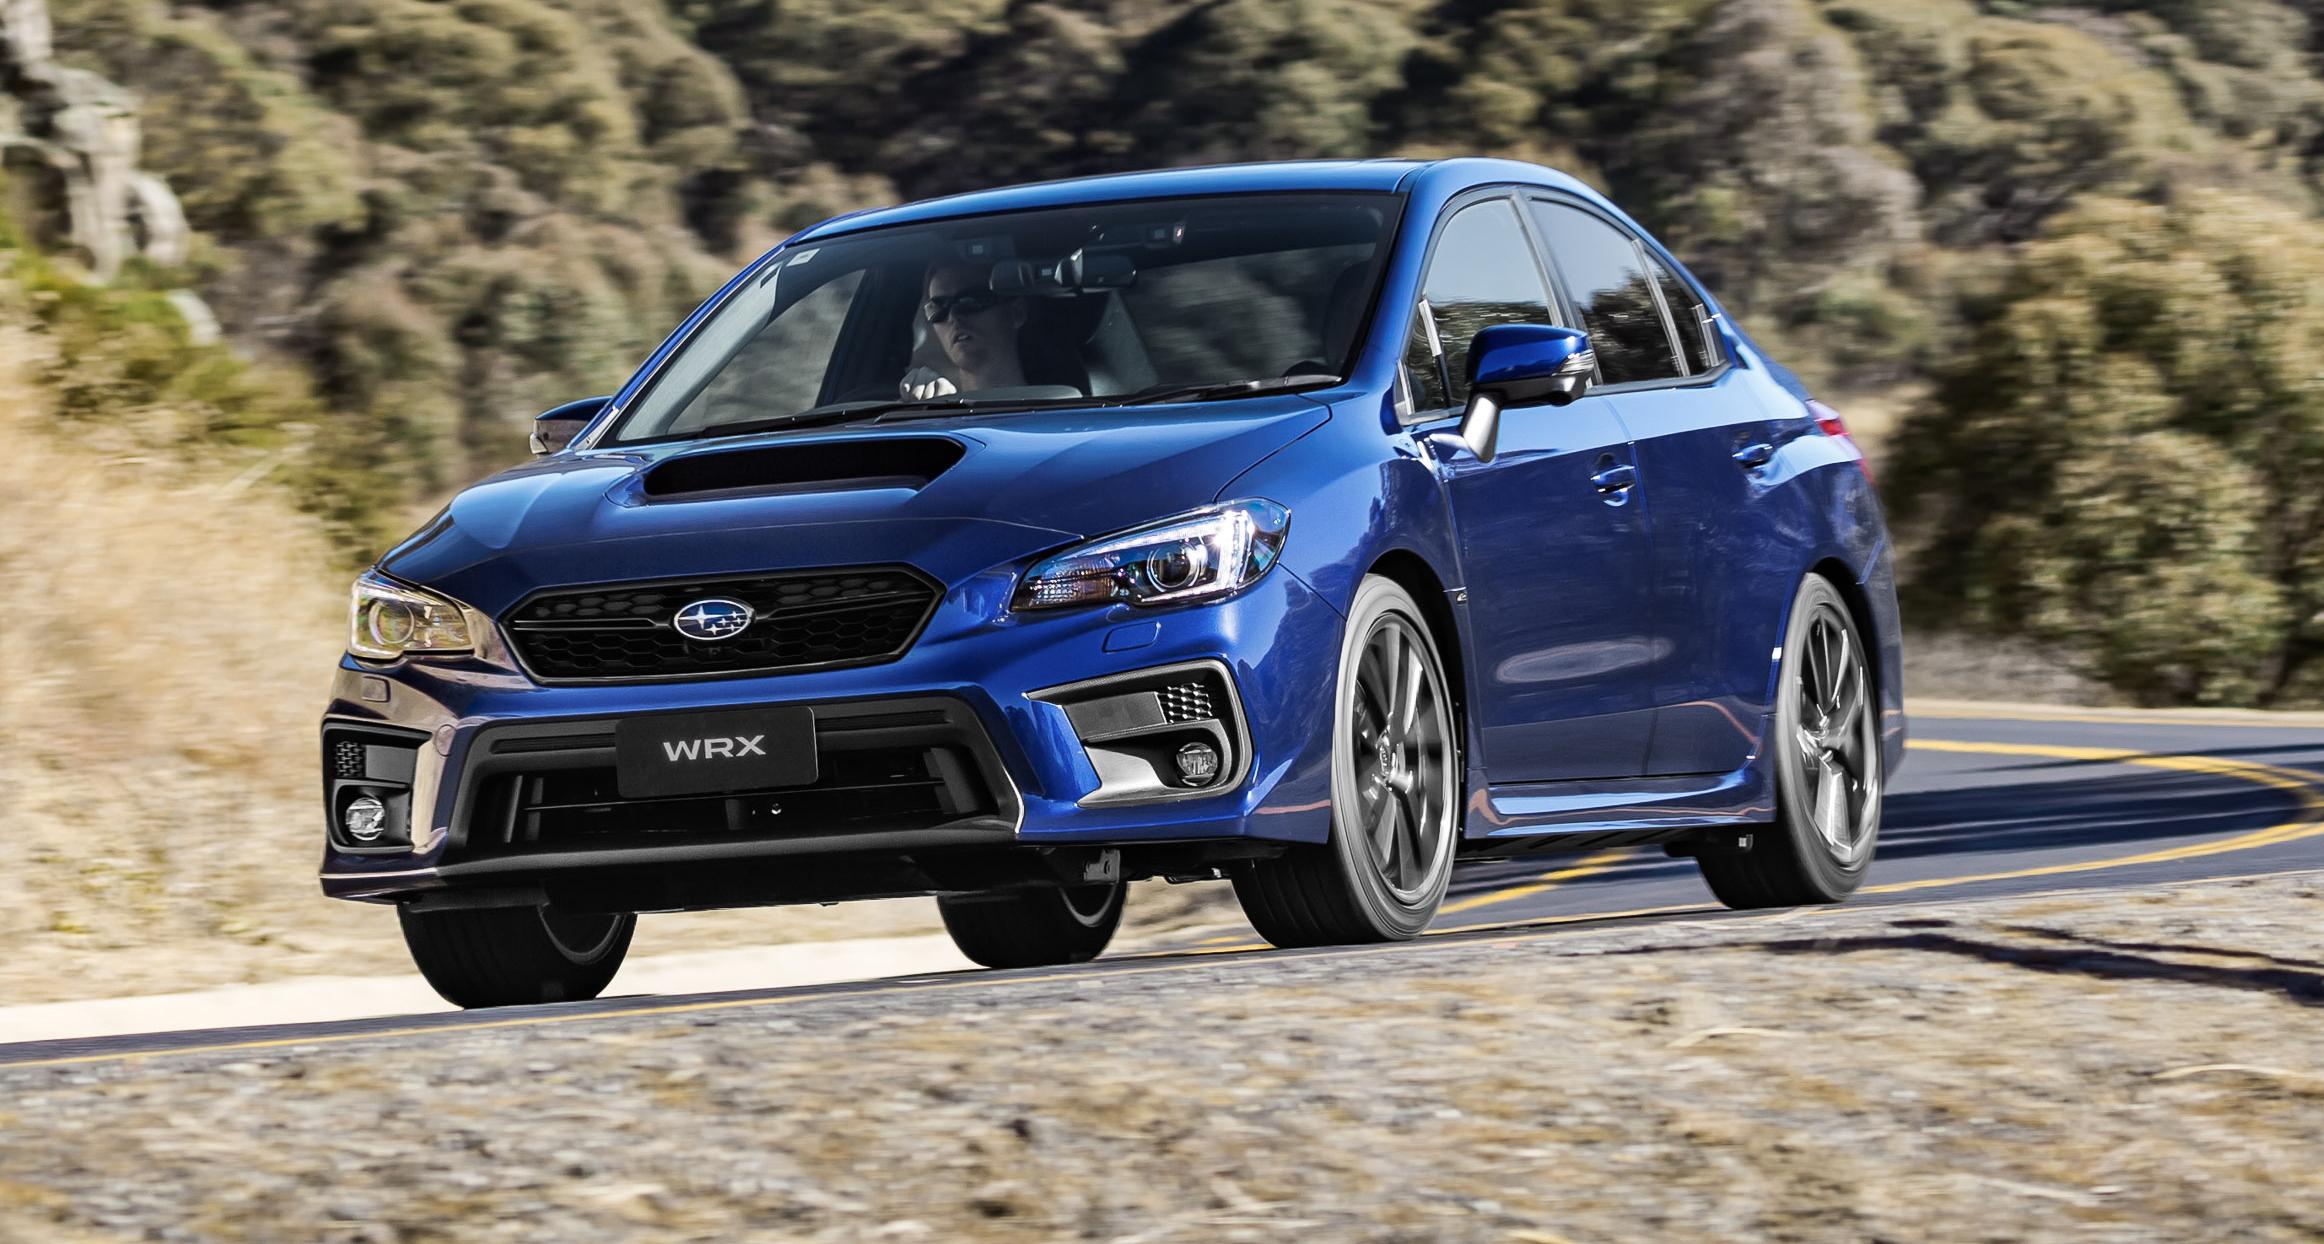 2018 Subaru WRX, WRX STI pricing and specs: Tweaked looks ...